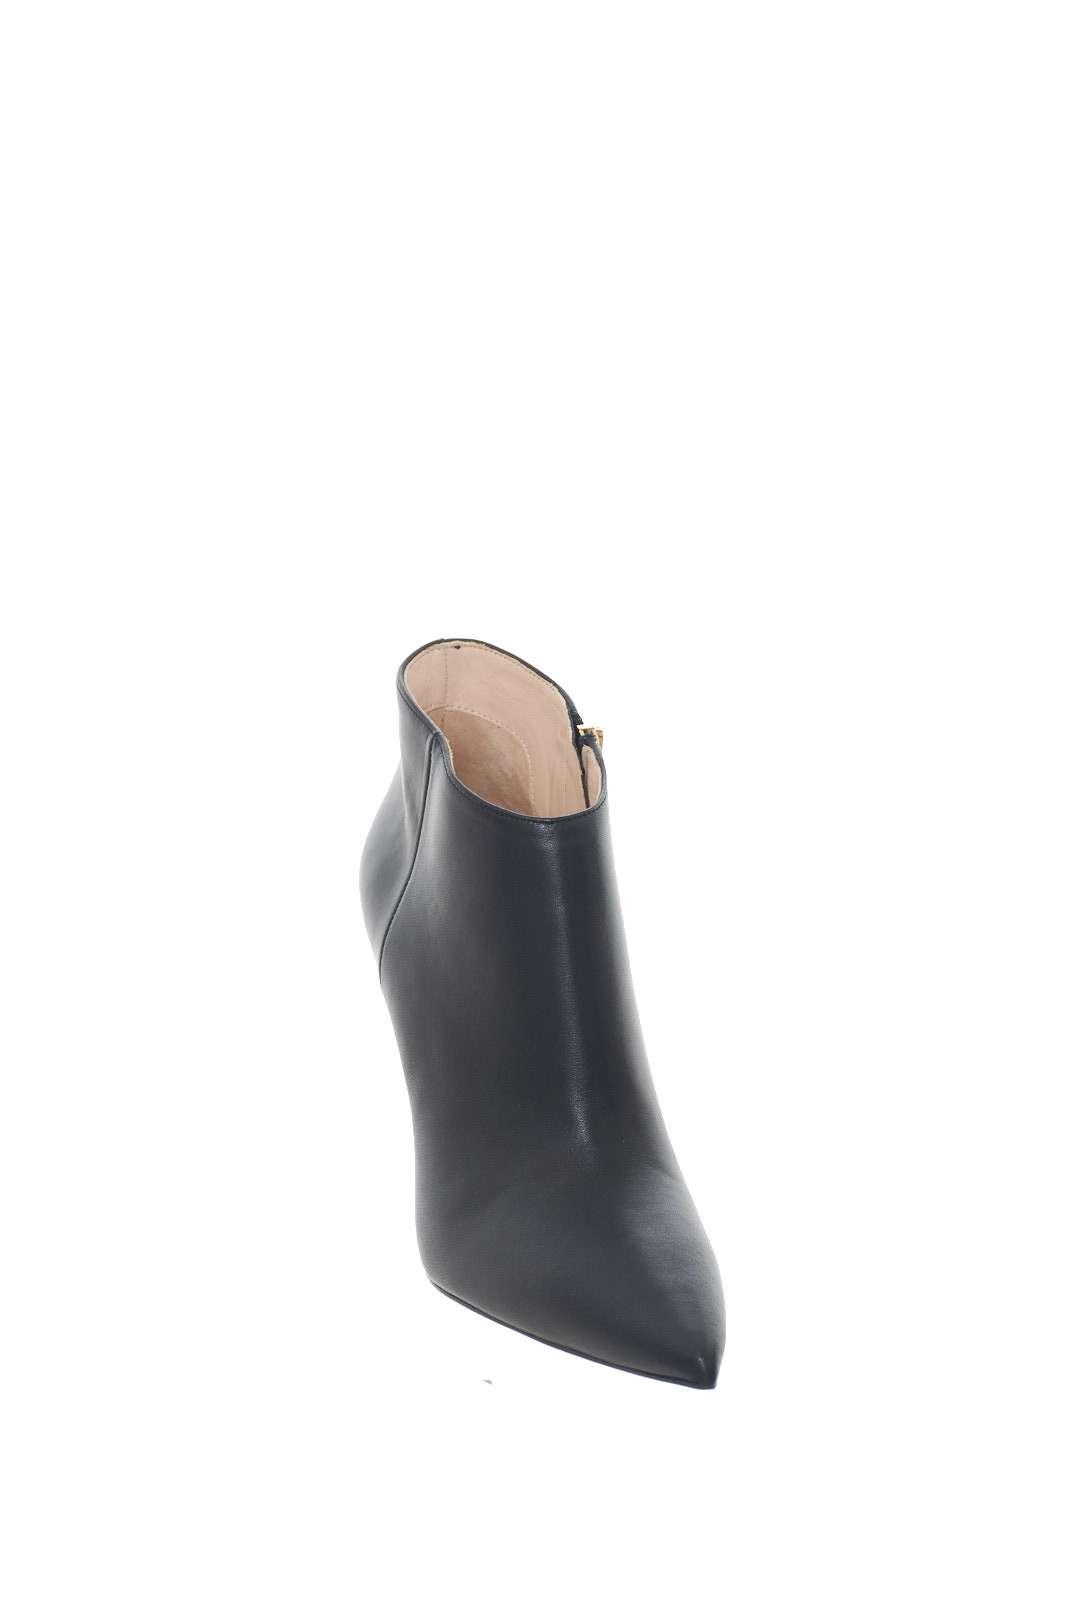 https://www.parmax.com/media/catalog/product/a/i/AI-outlet_parmax-scarpe-donna-Liu-Jo-SXX525-B.jpg